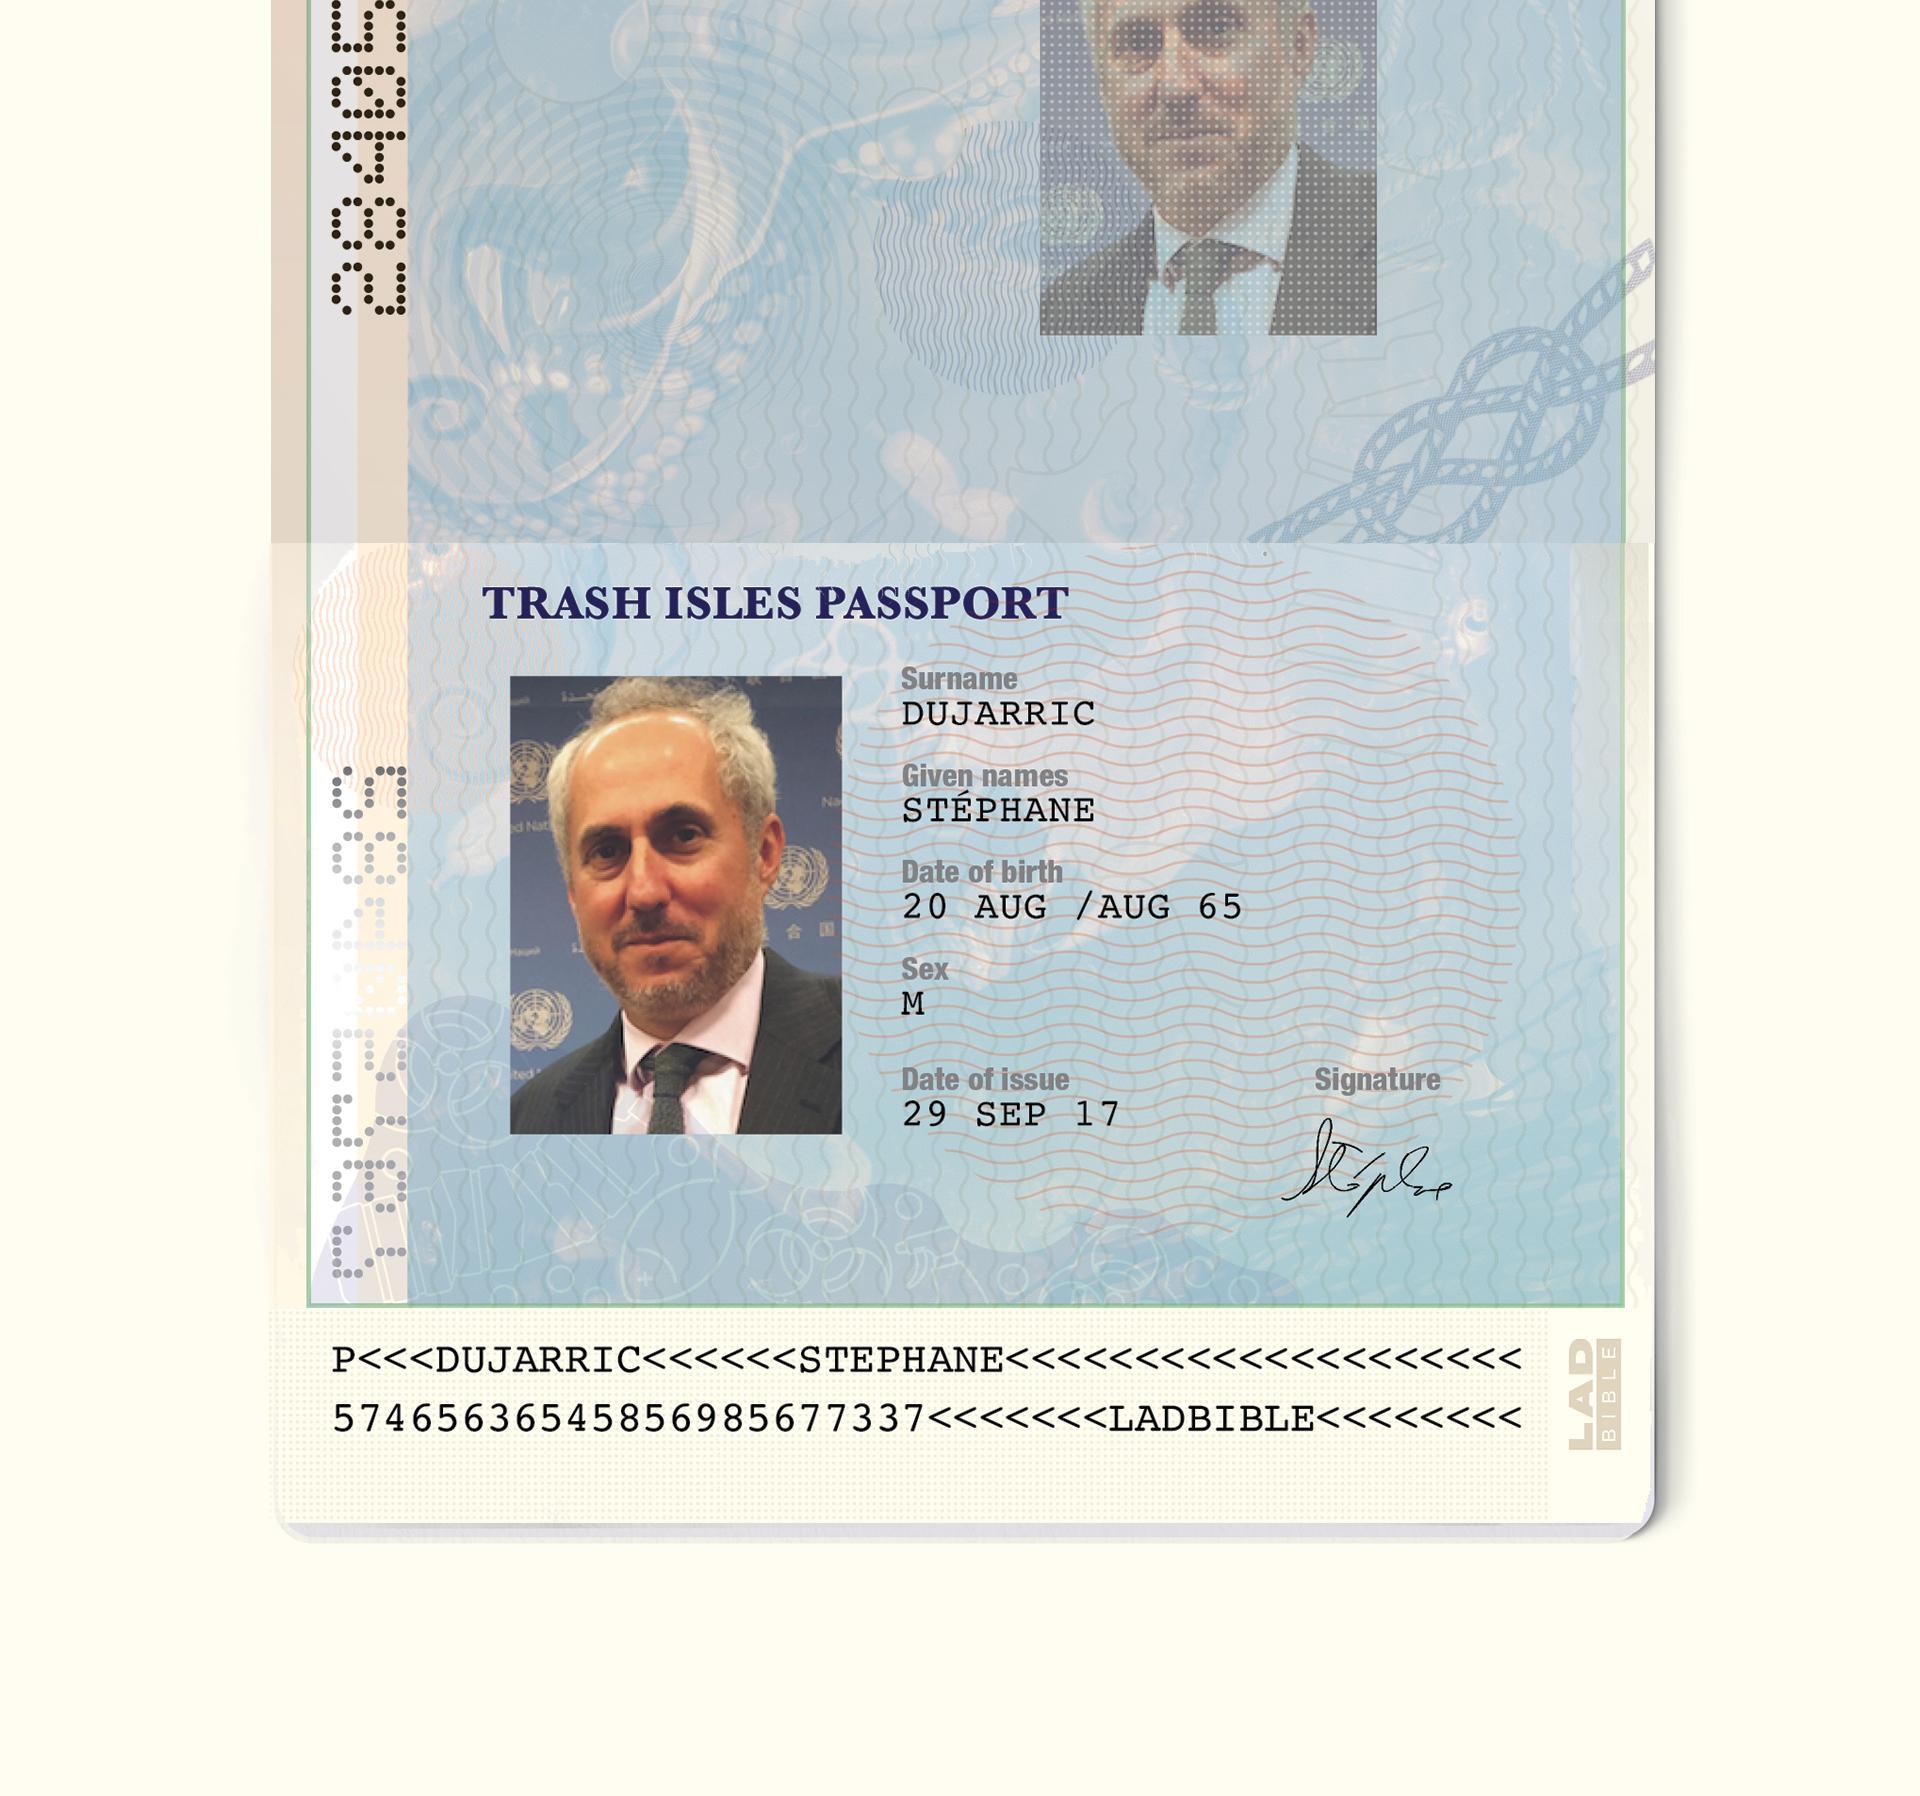 Trash Isles passport